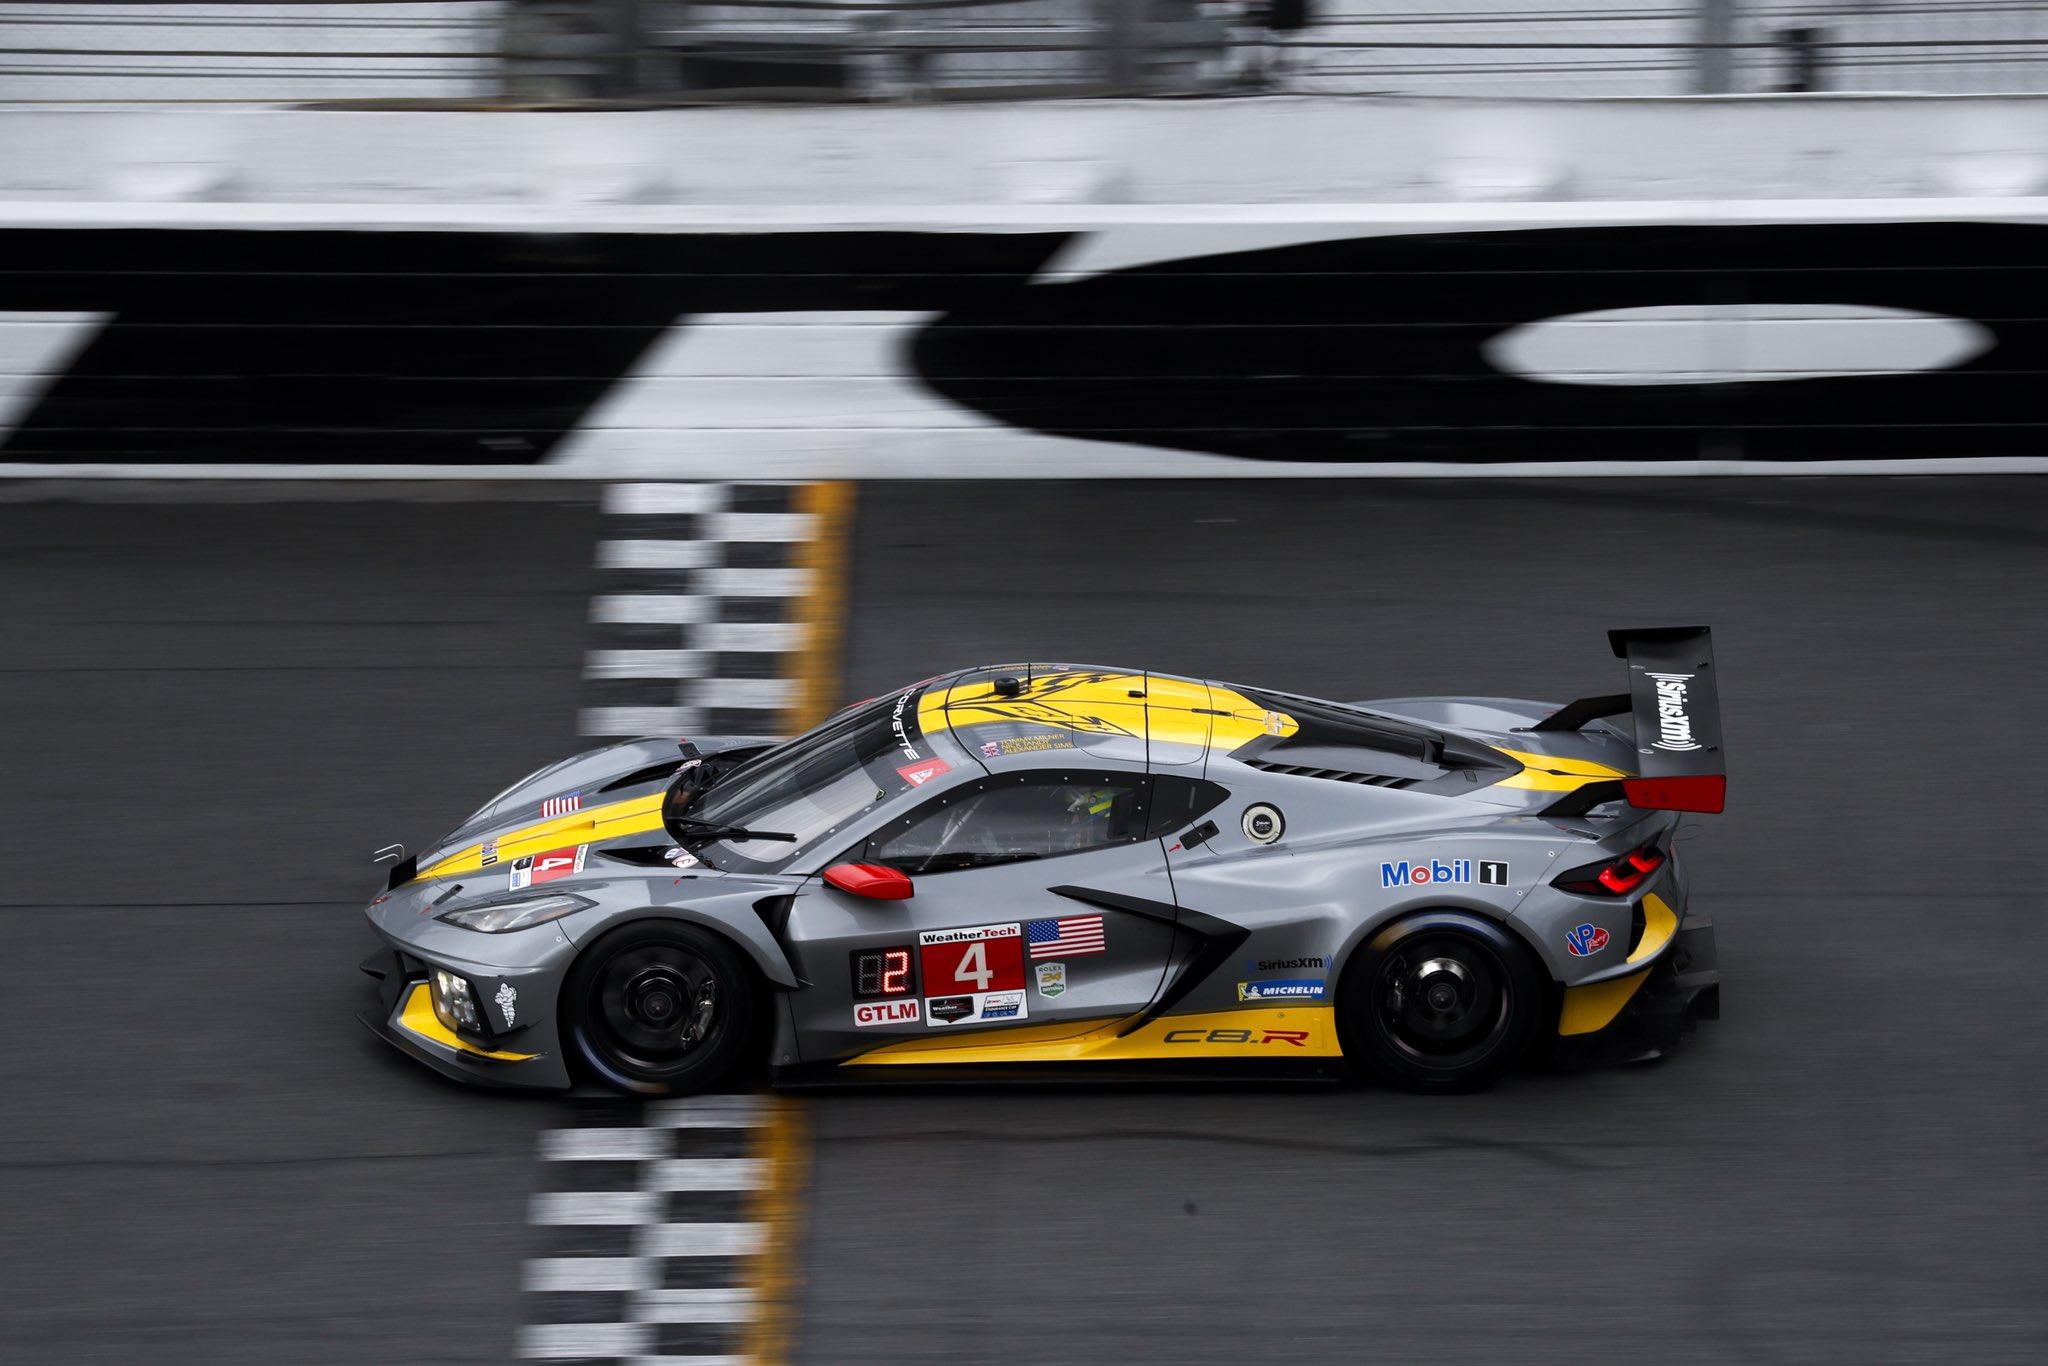 Daytona, Rolex 24 Hours, Motul Pole Award